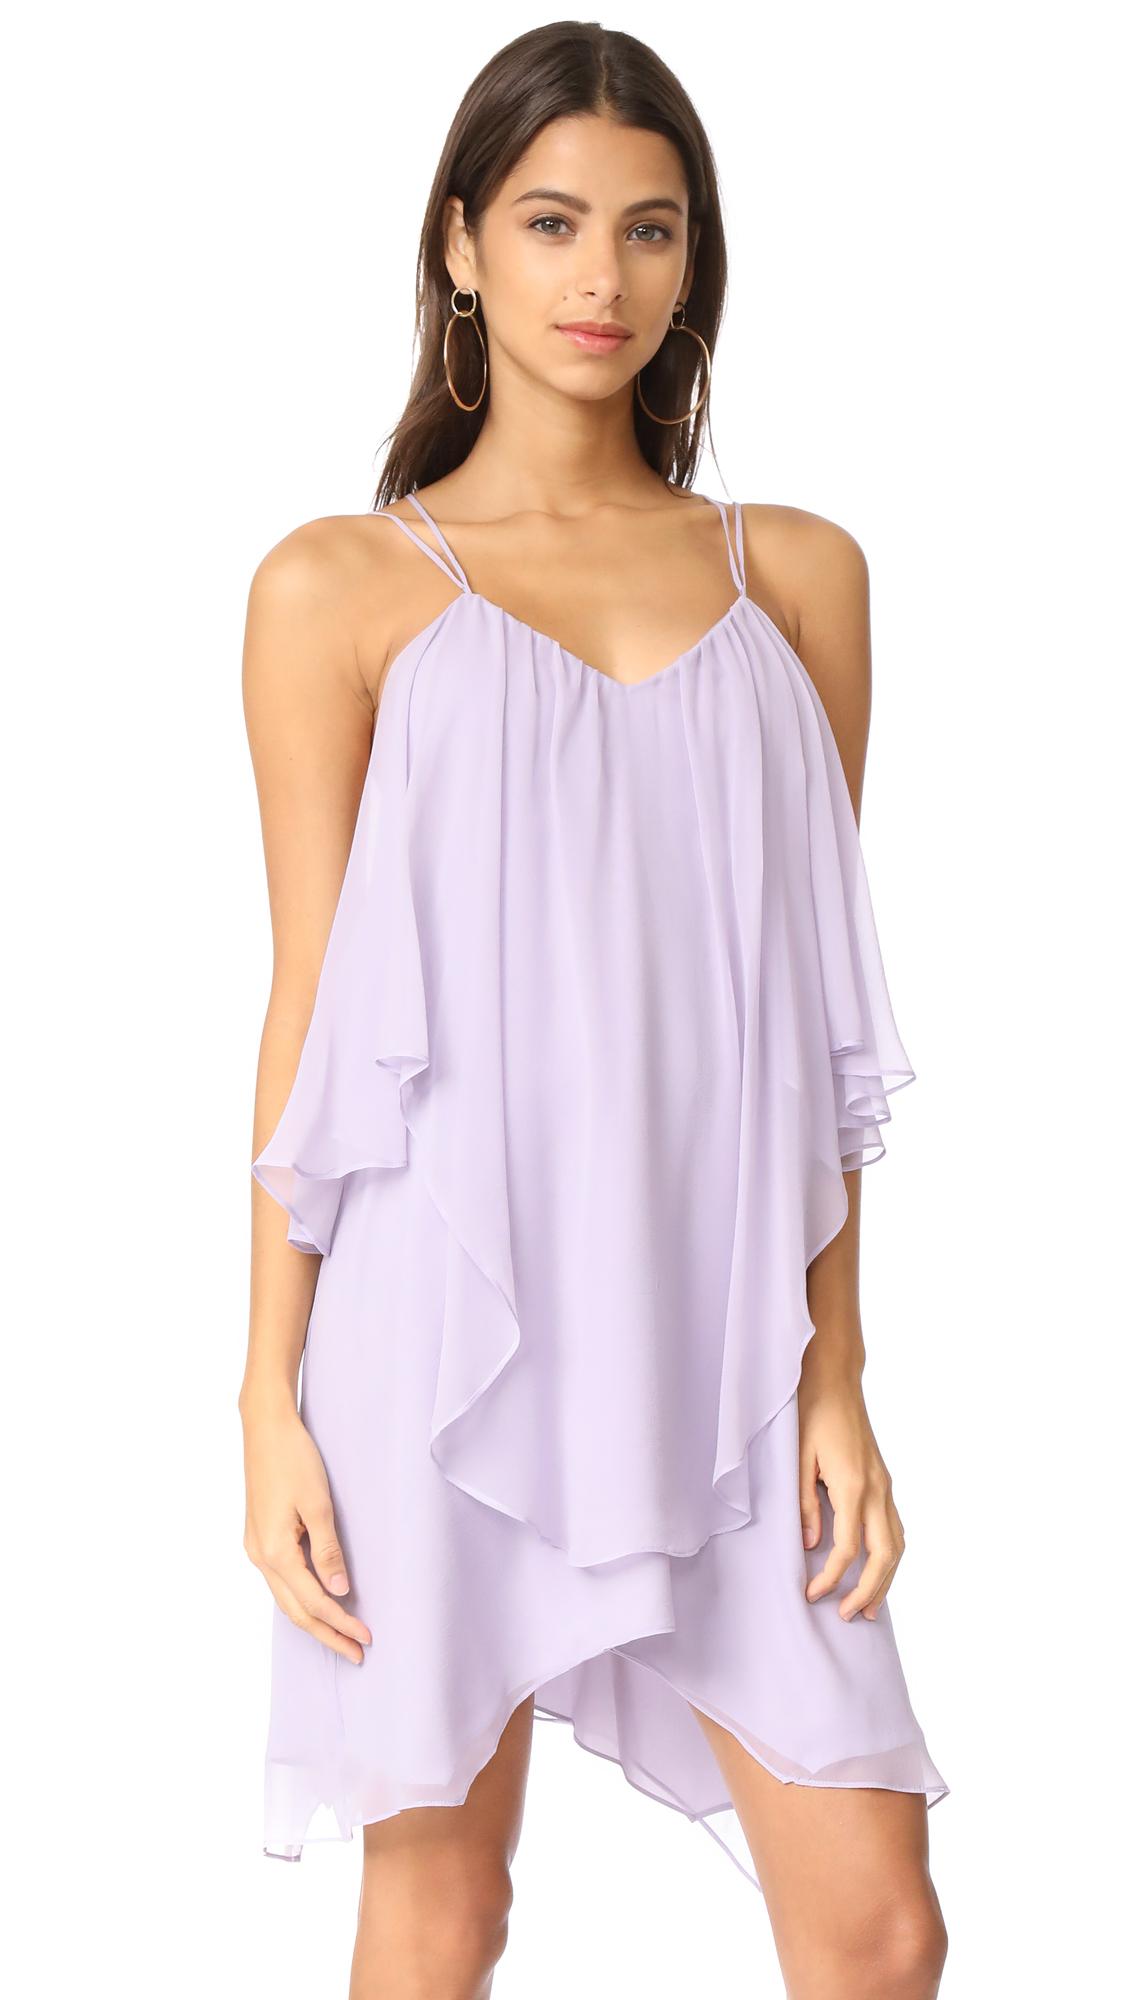 Haute Hippie Ruffle Tank Dress - Pale Violet